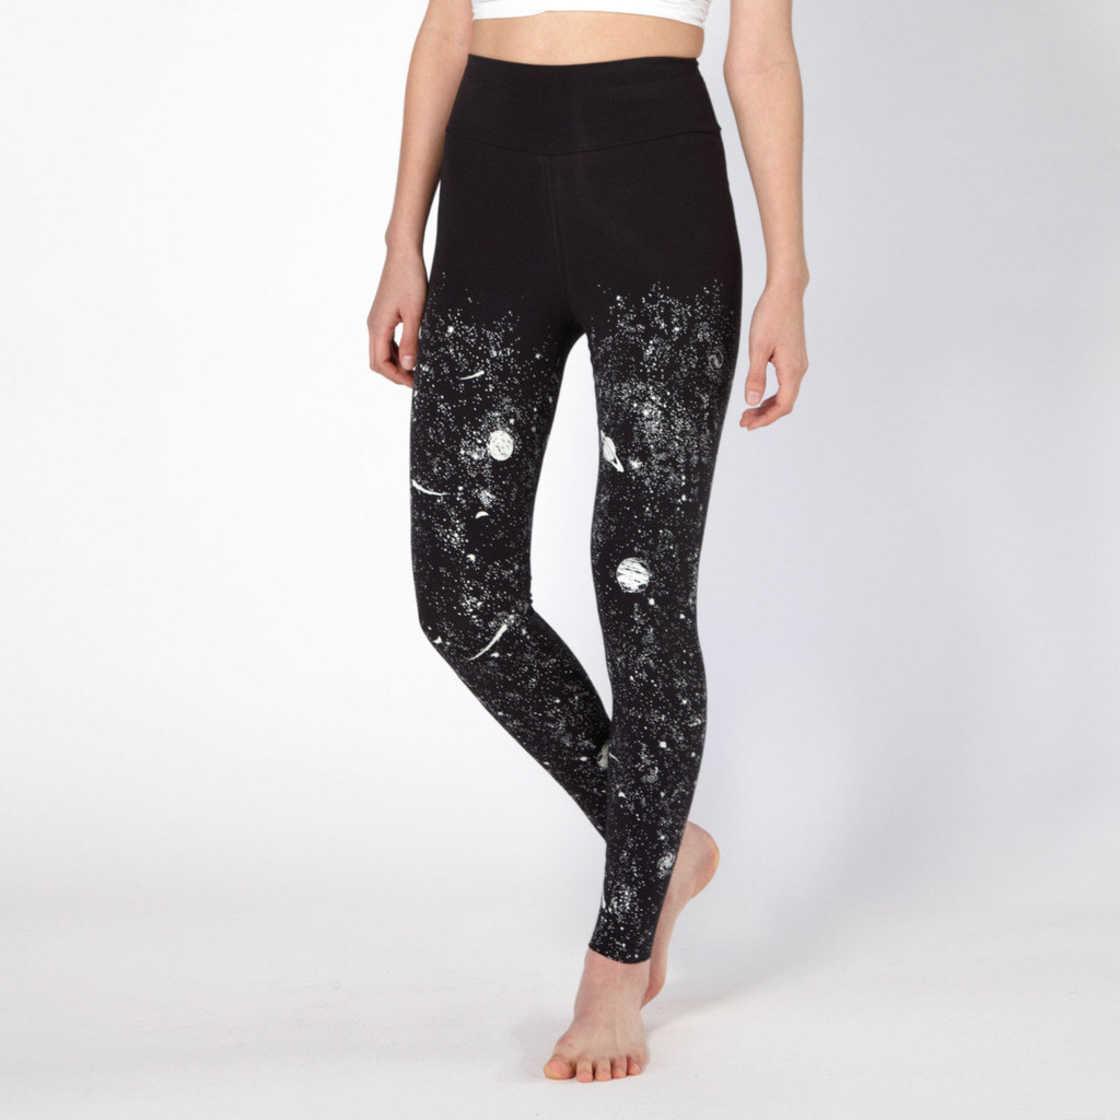 Galactic Underwear - Awesome glow-in-the-dark underwear